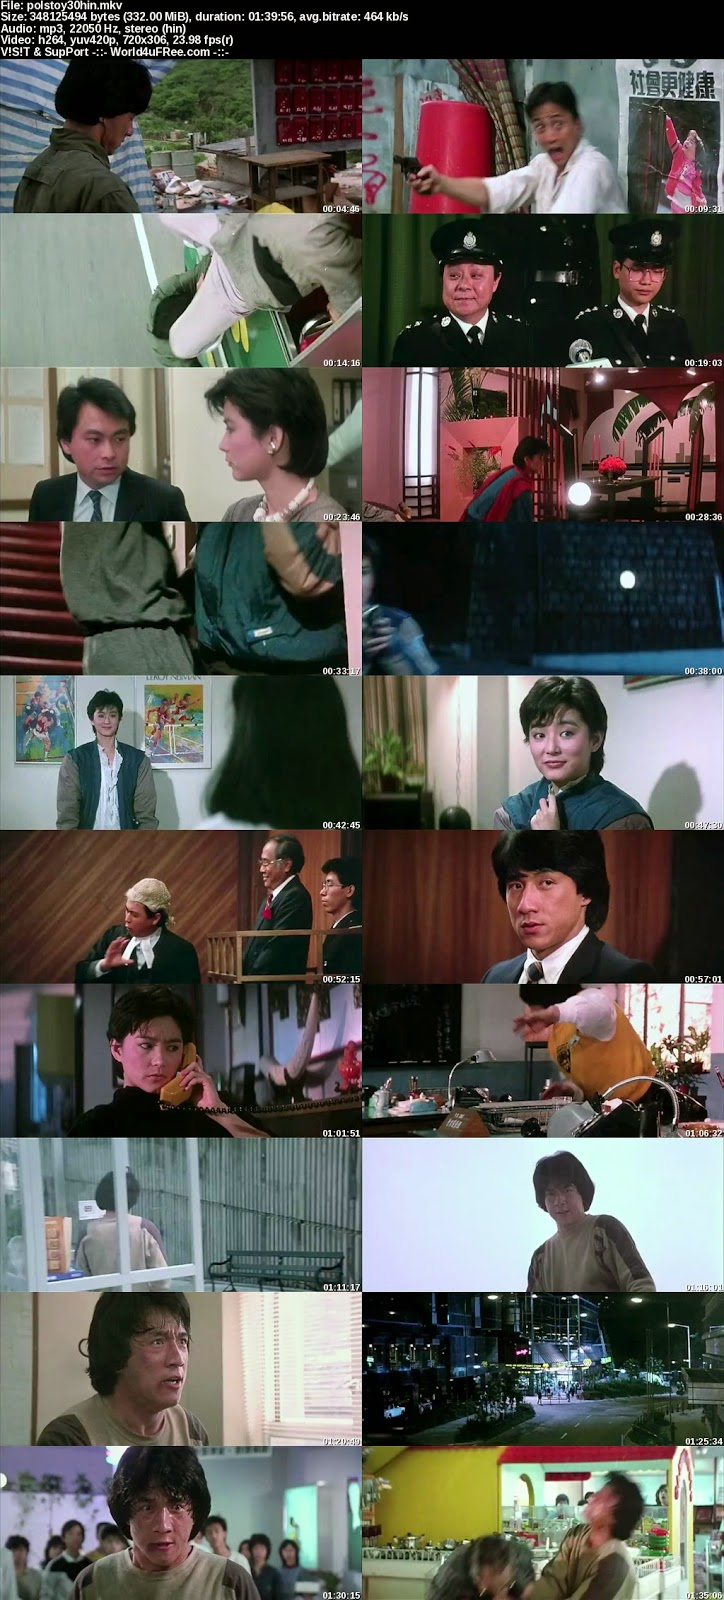 1985 bollywood movies download - 90210 season 3 episode 21